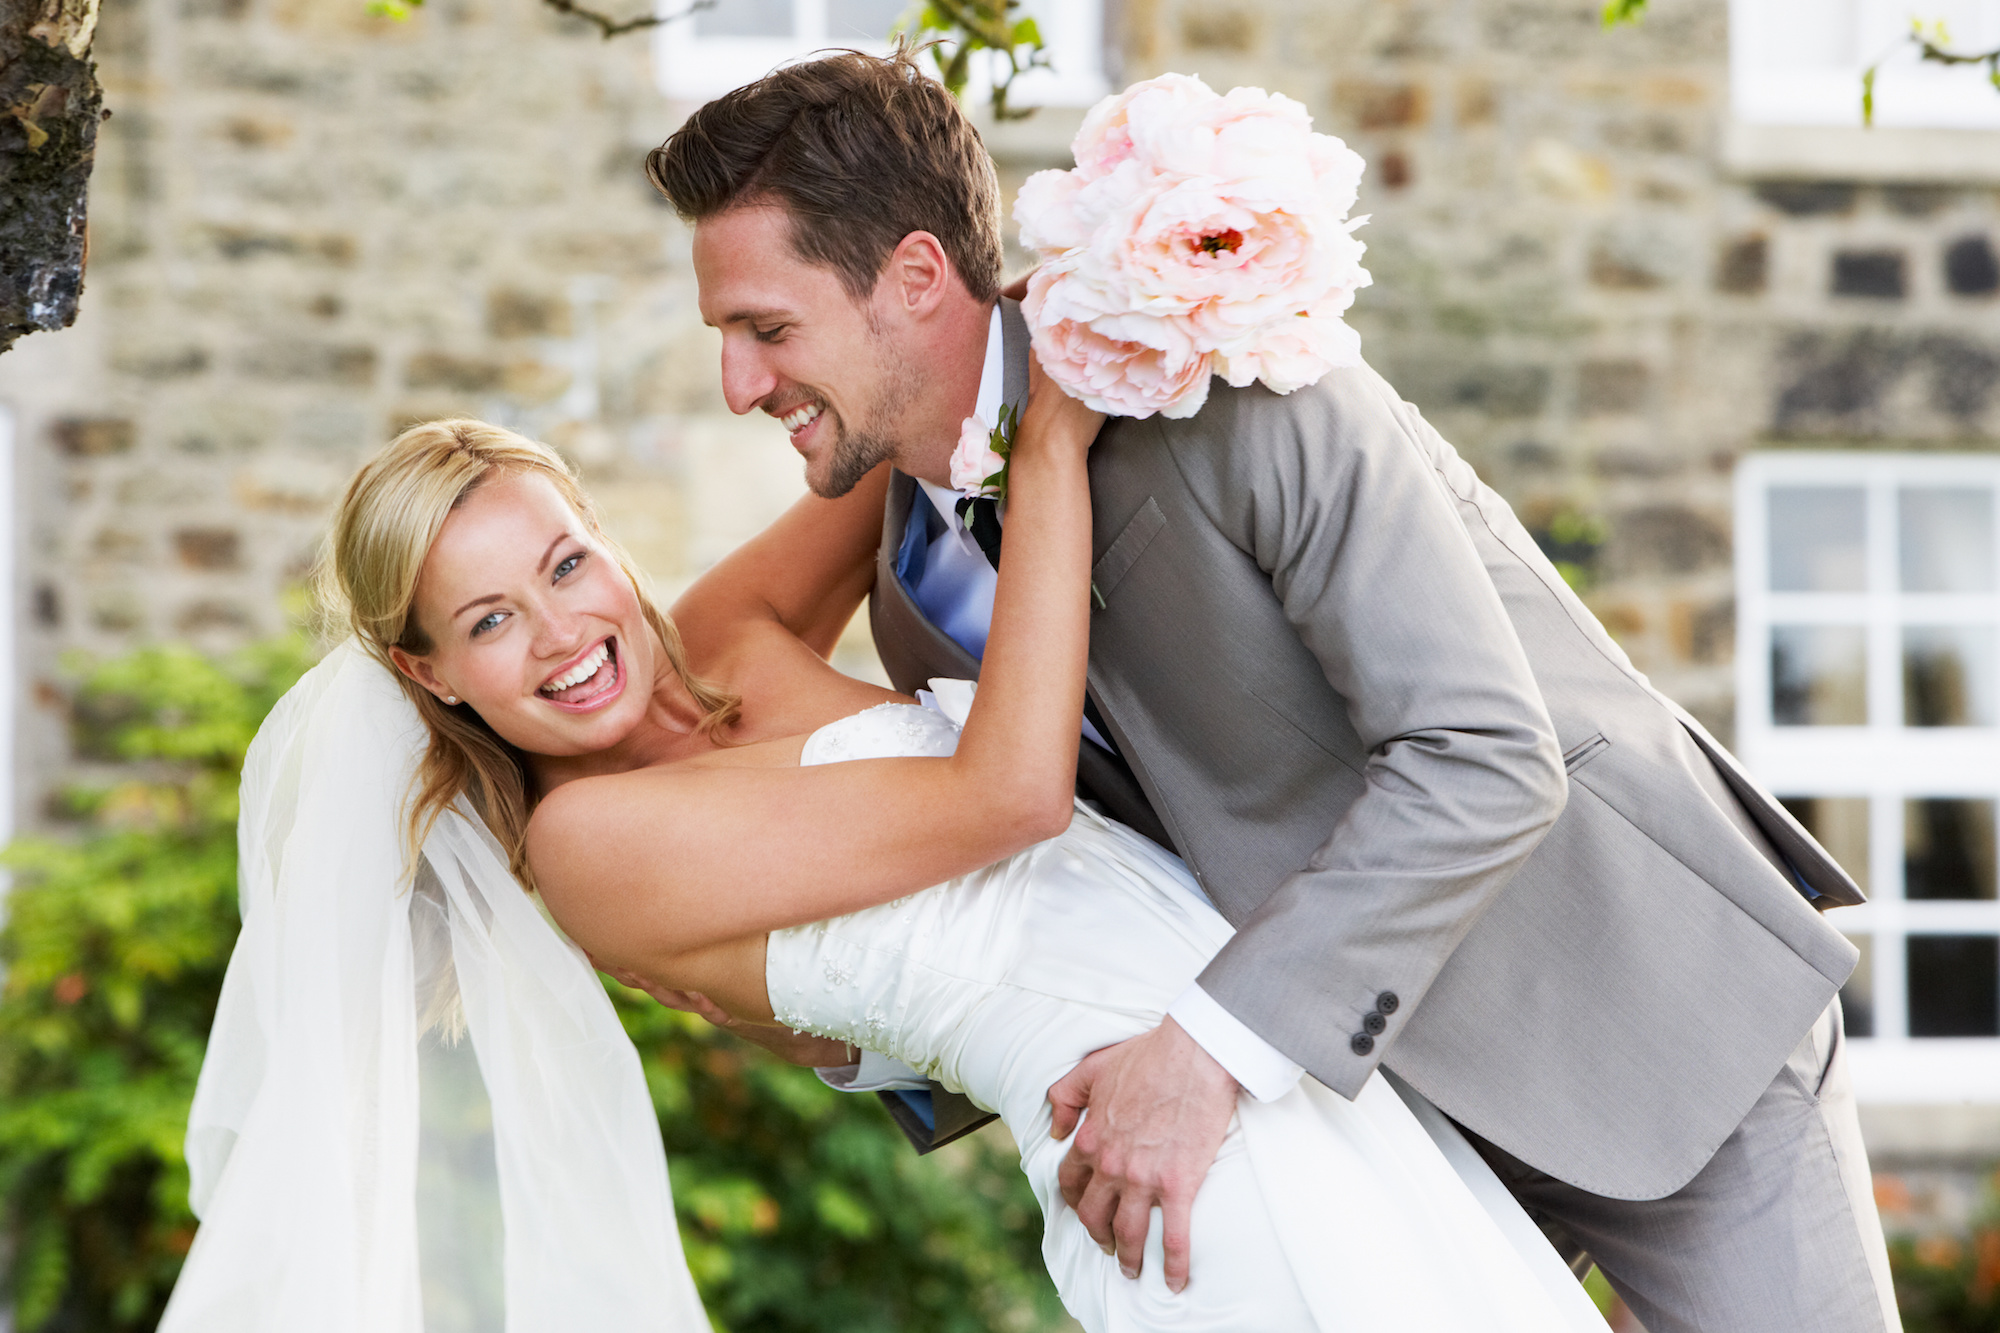 Happiedays make your own wedding newspaper